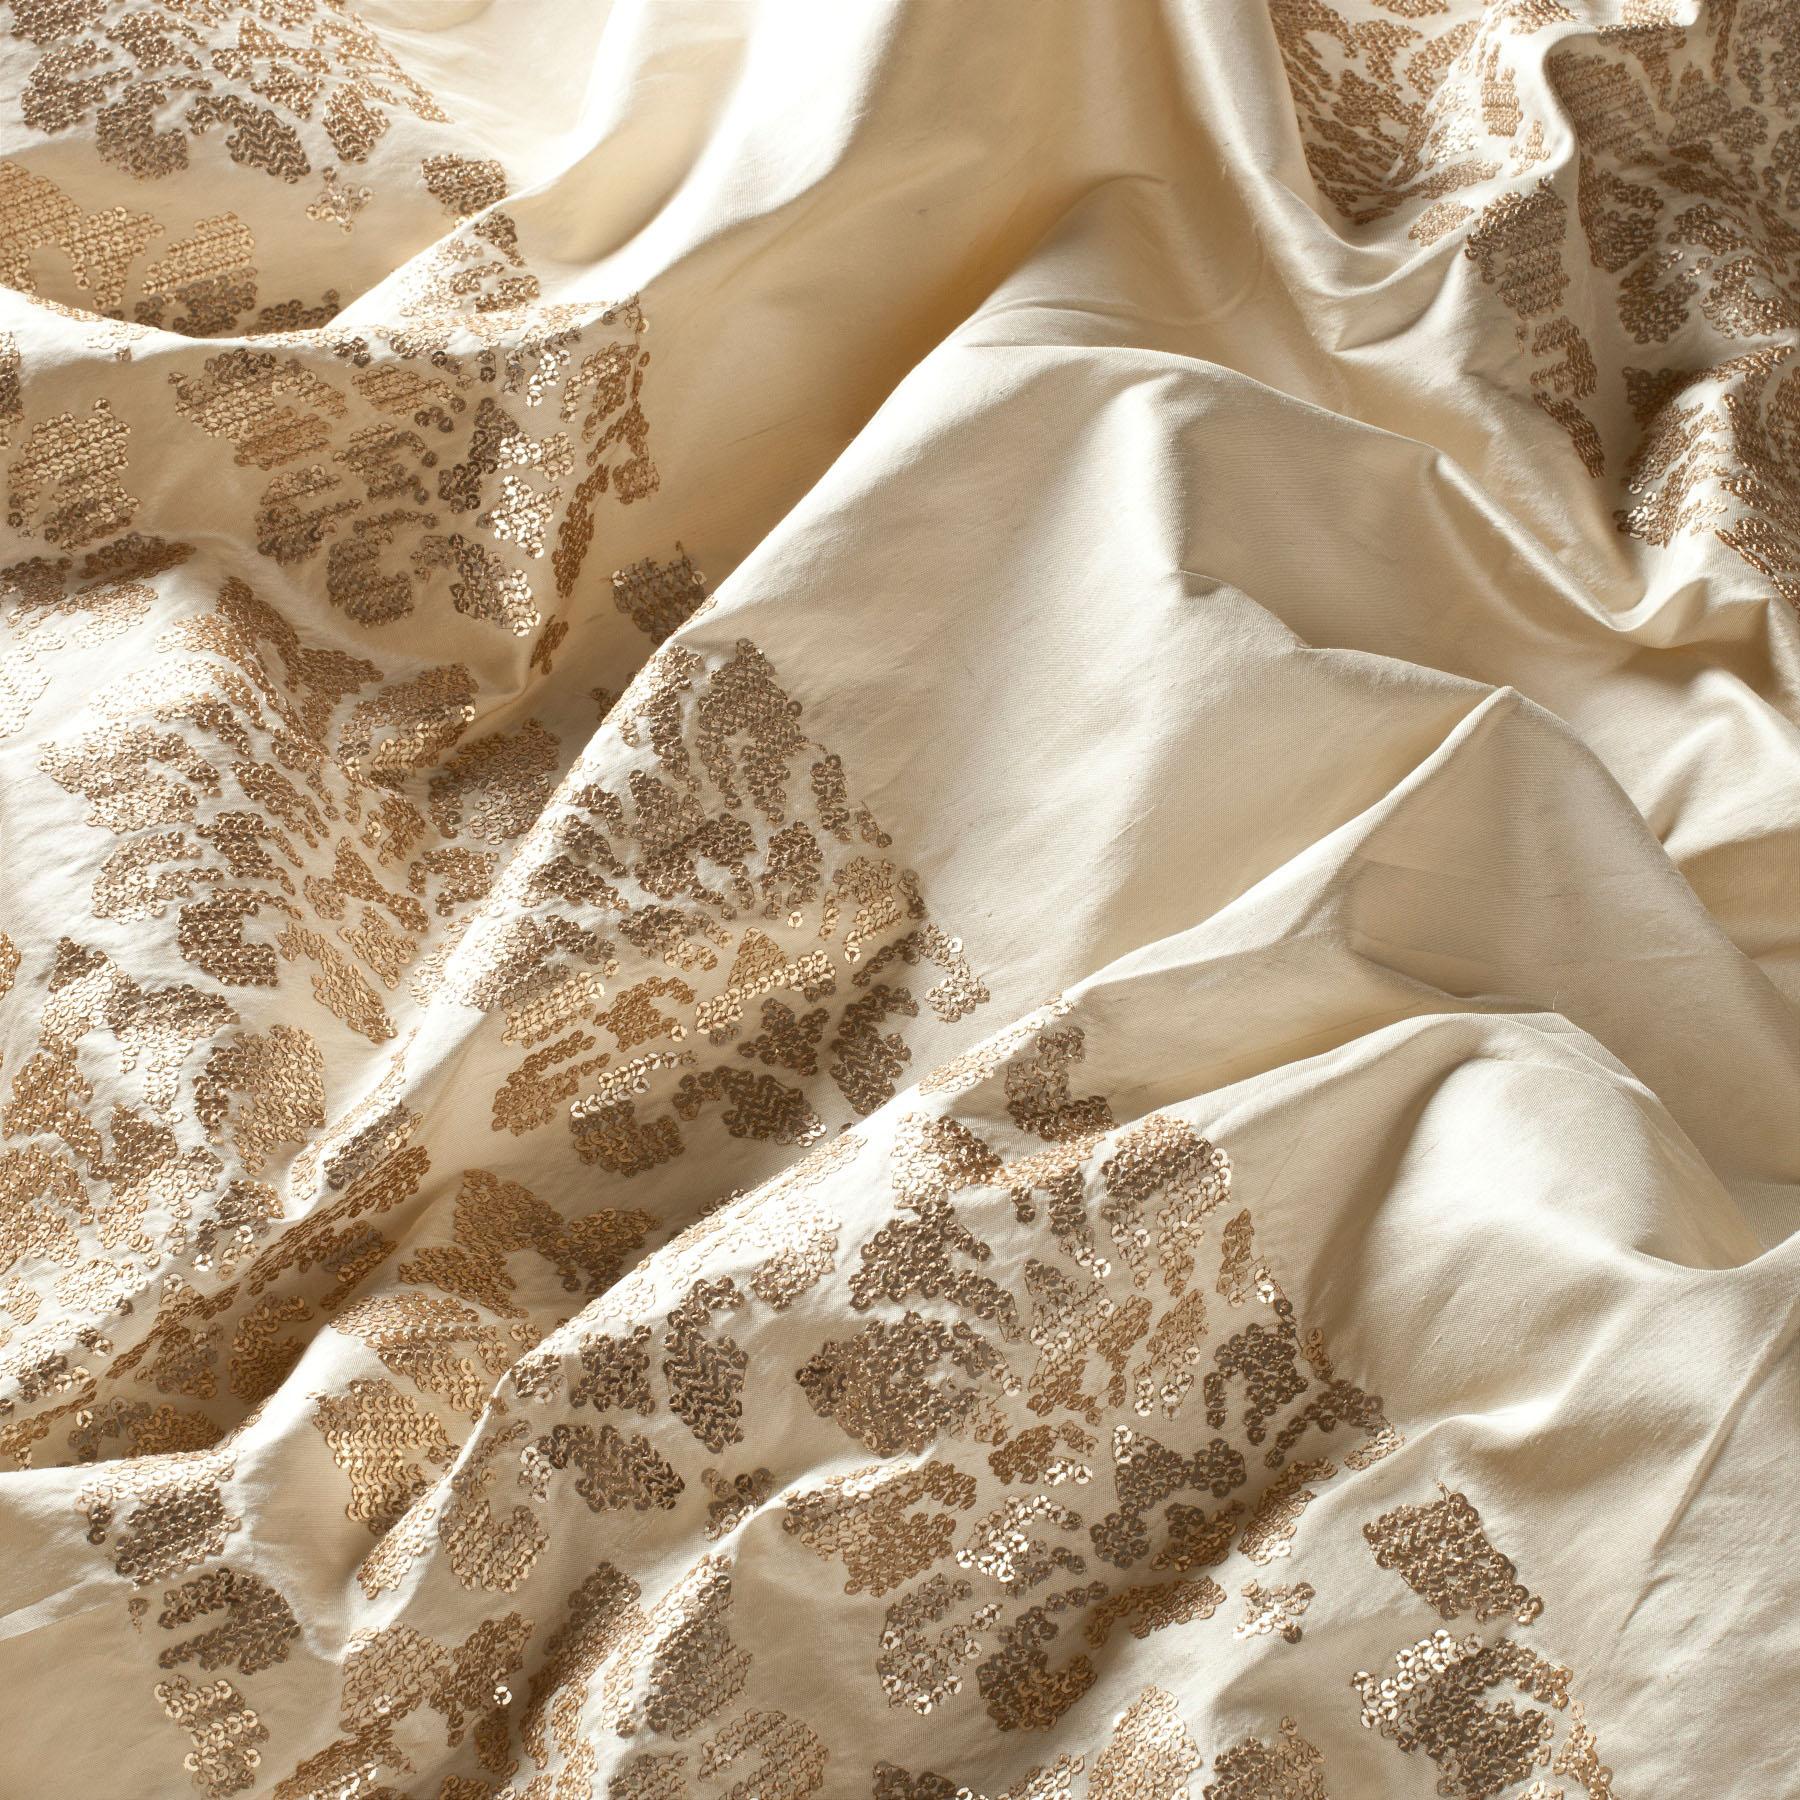 decoration fabric lamporo 9 7383 070 jab anstoetz. Black Bedroom Furniture Sets. Home Design Ideas